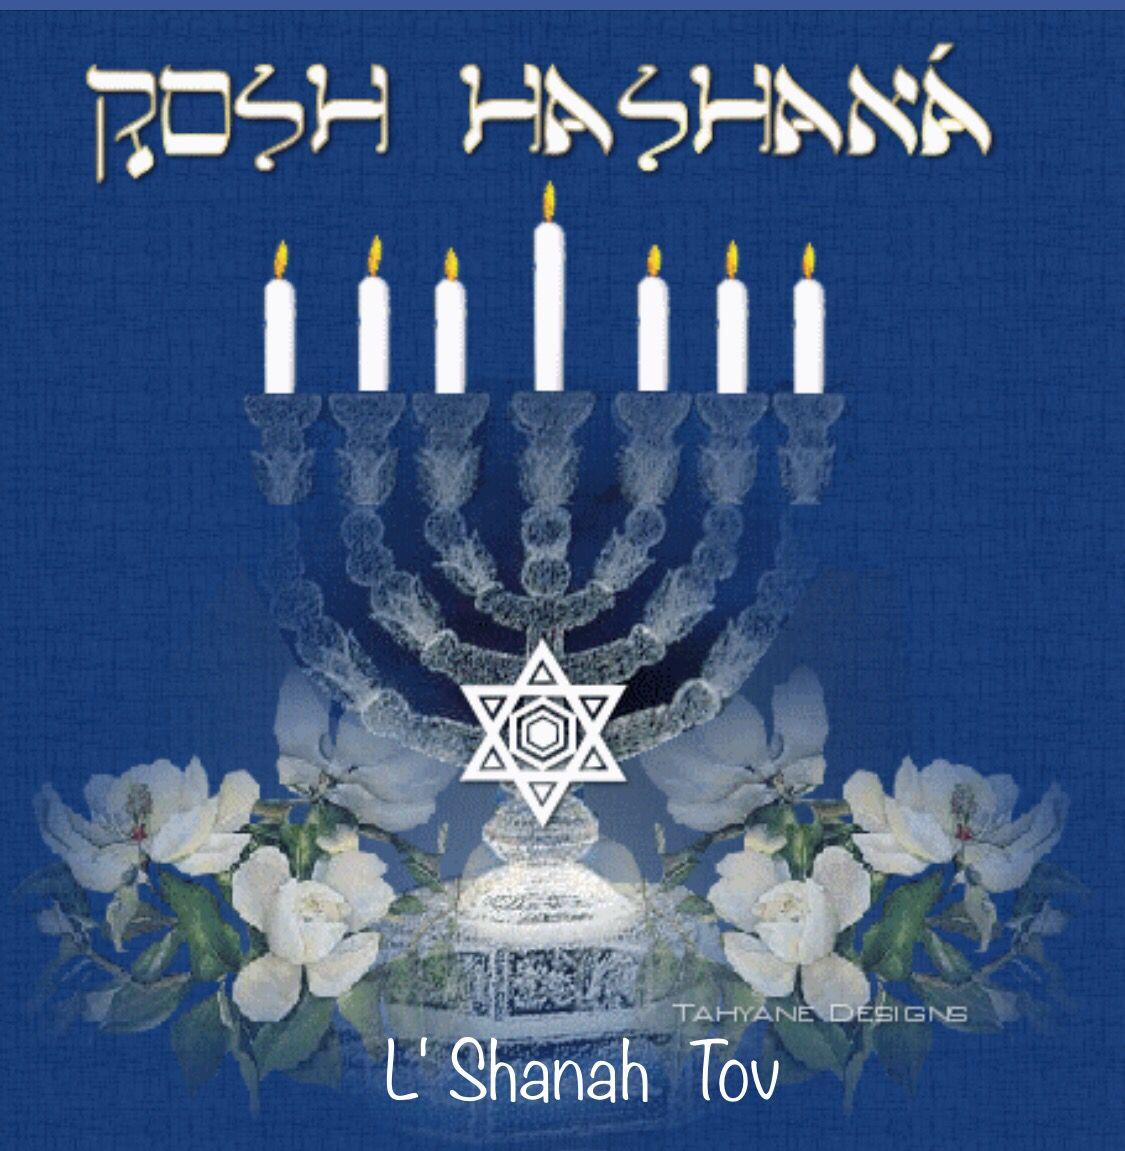 J rosh hashana pinteres j rosh hashana ms more kristyandbryce Images